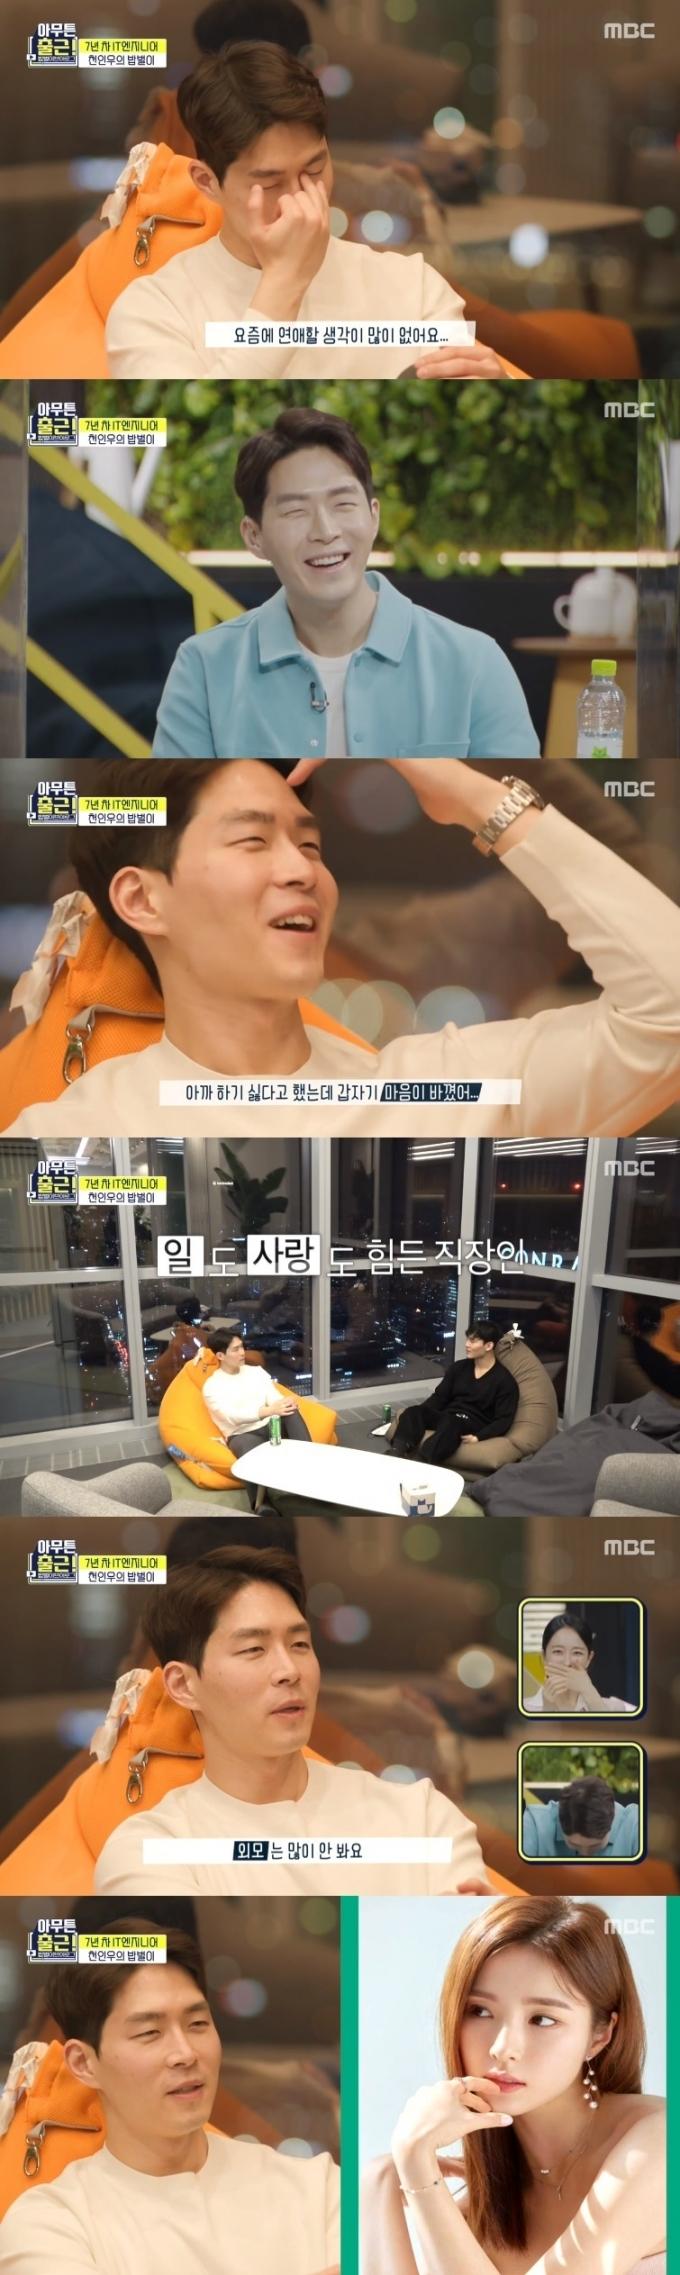 MBC '아무튼 출근' 캡처 © 뉴스1